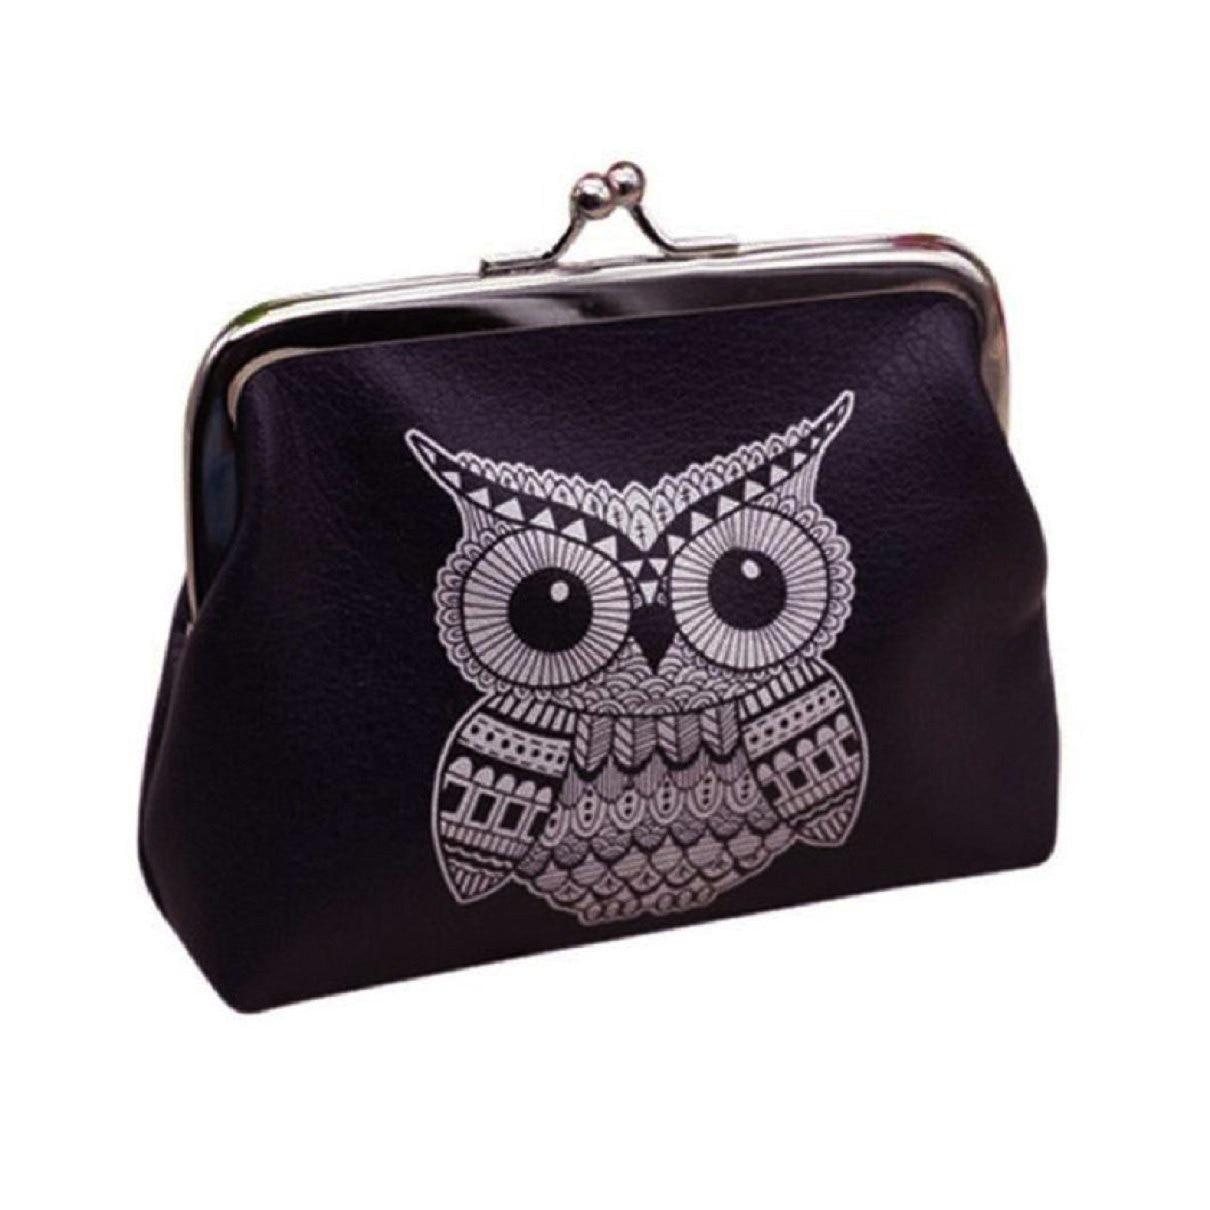 FGGS Womens Lady Wallet Bag Coin Purse Clutch Handbag (Owl)